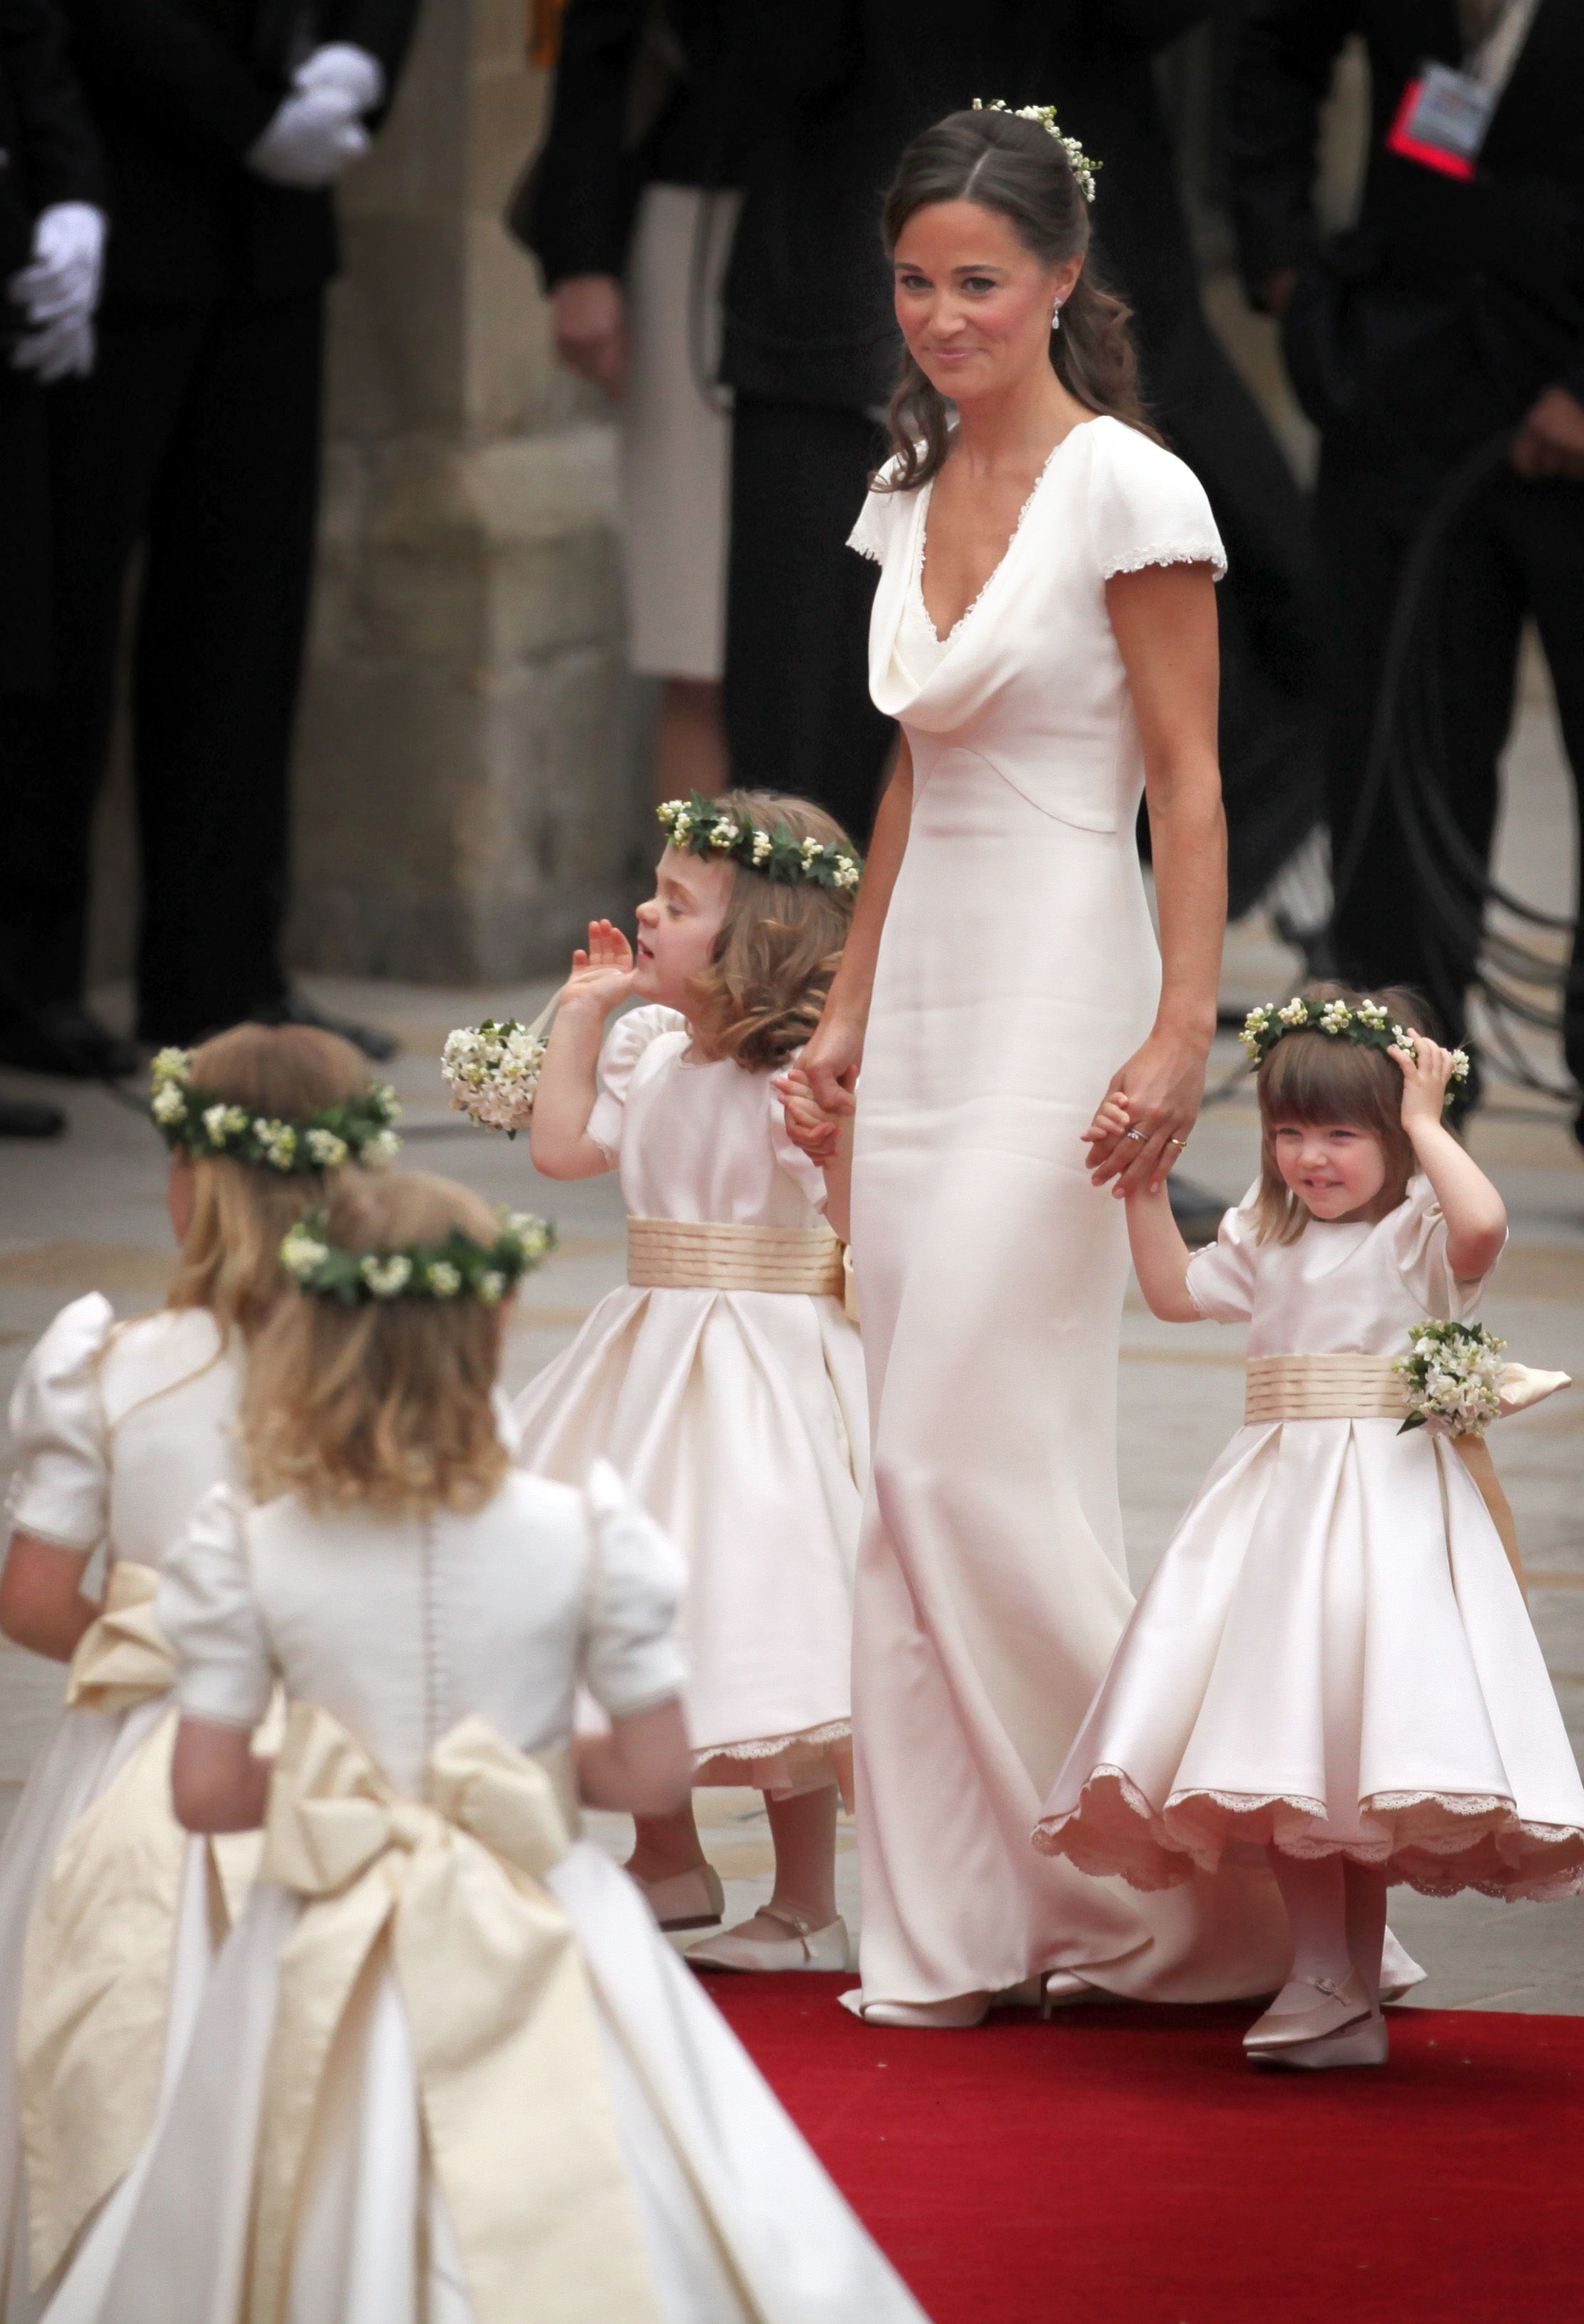 Wedding royal bridesmaids | Royal Family Fashion | Pinterest ...